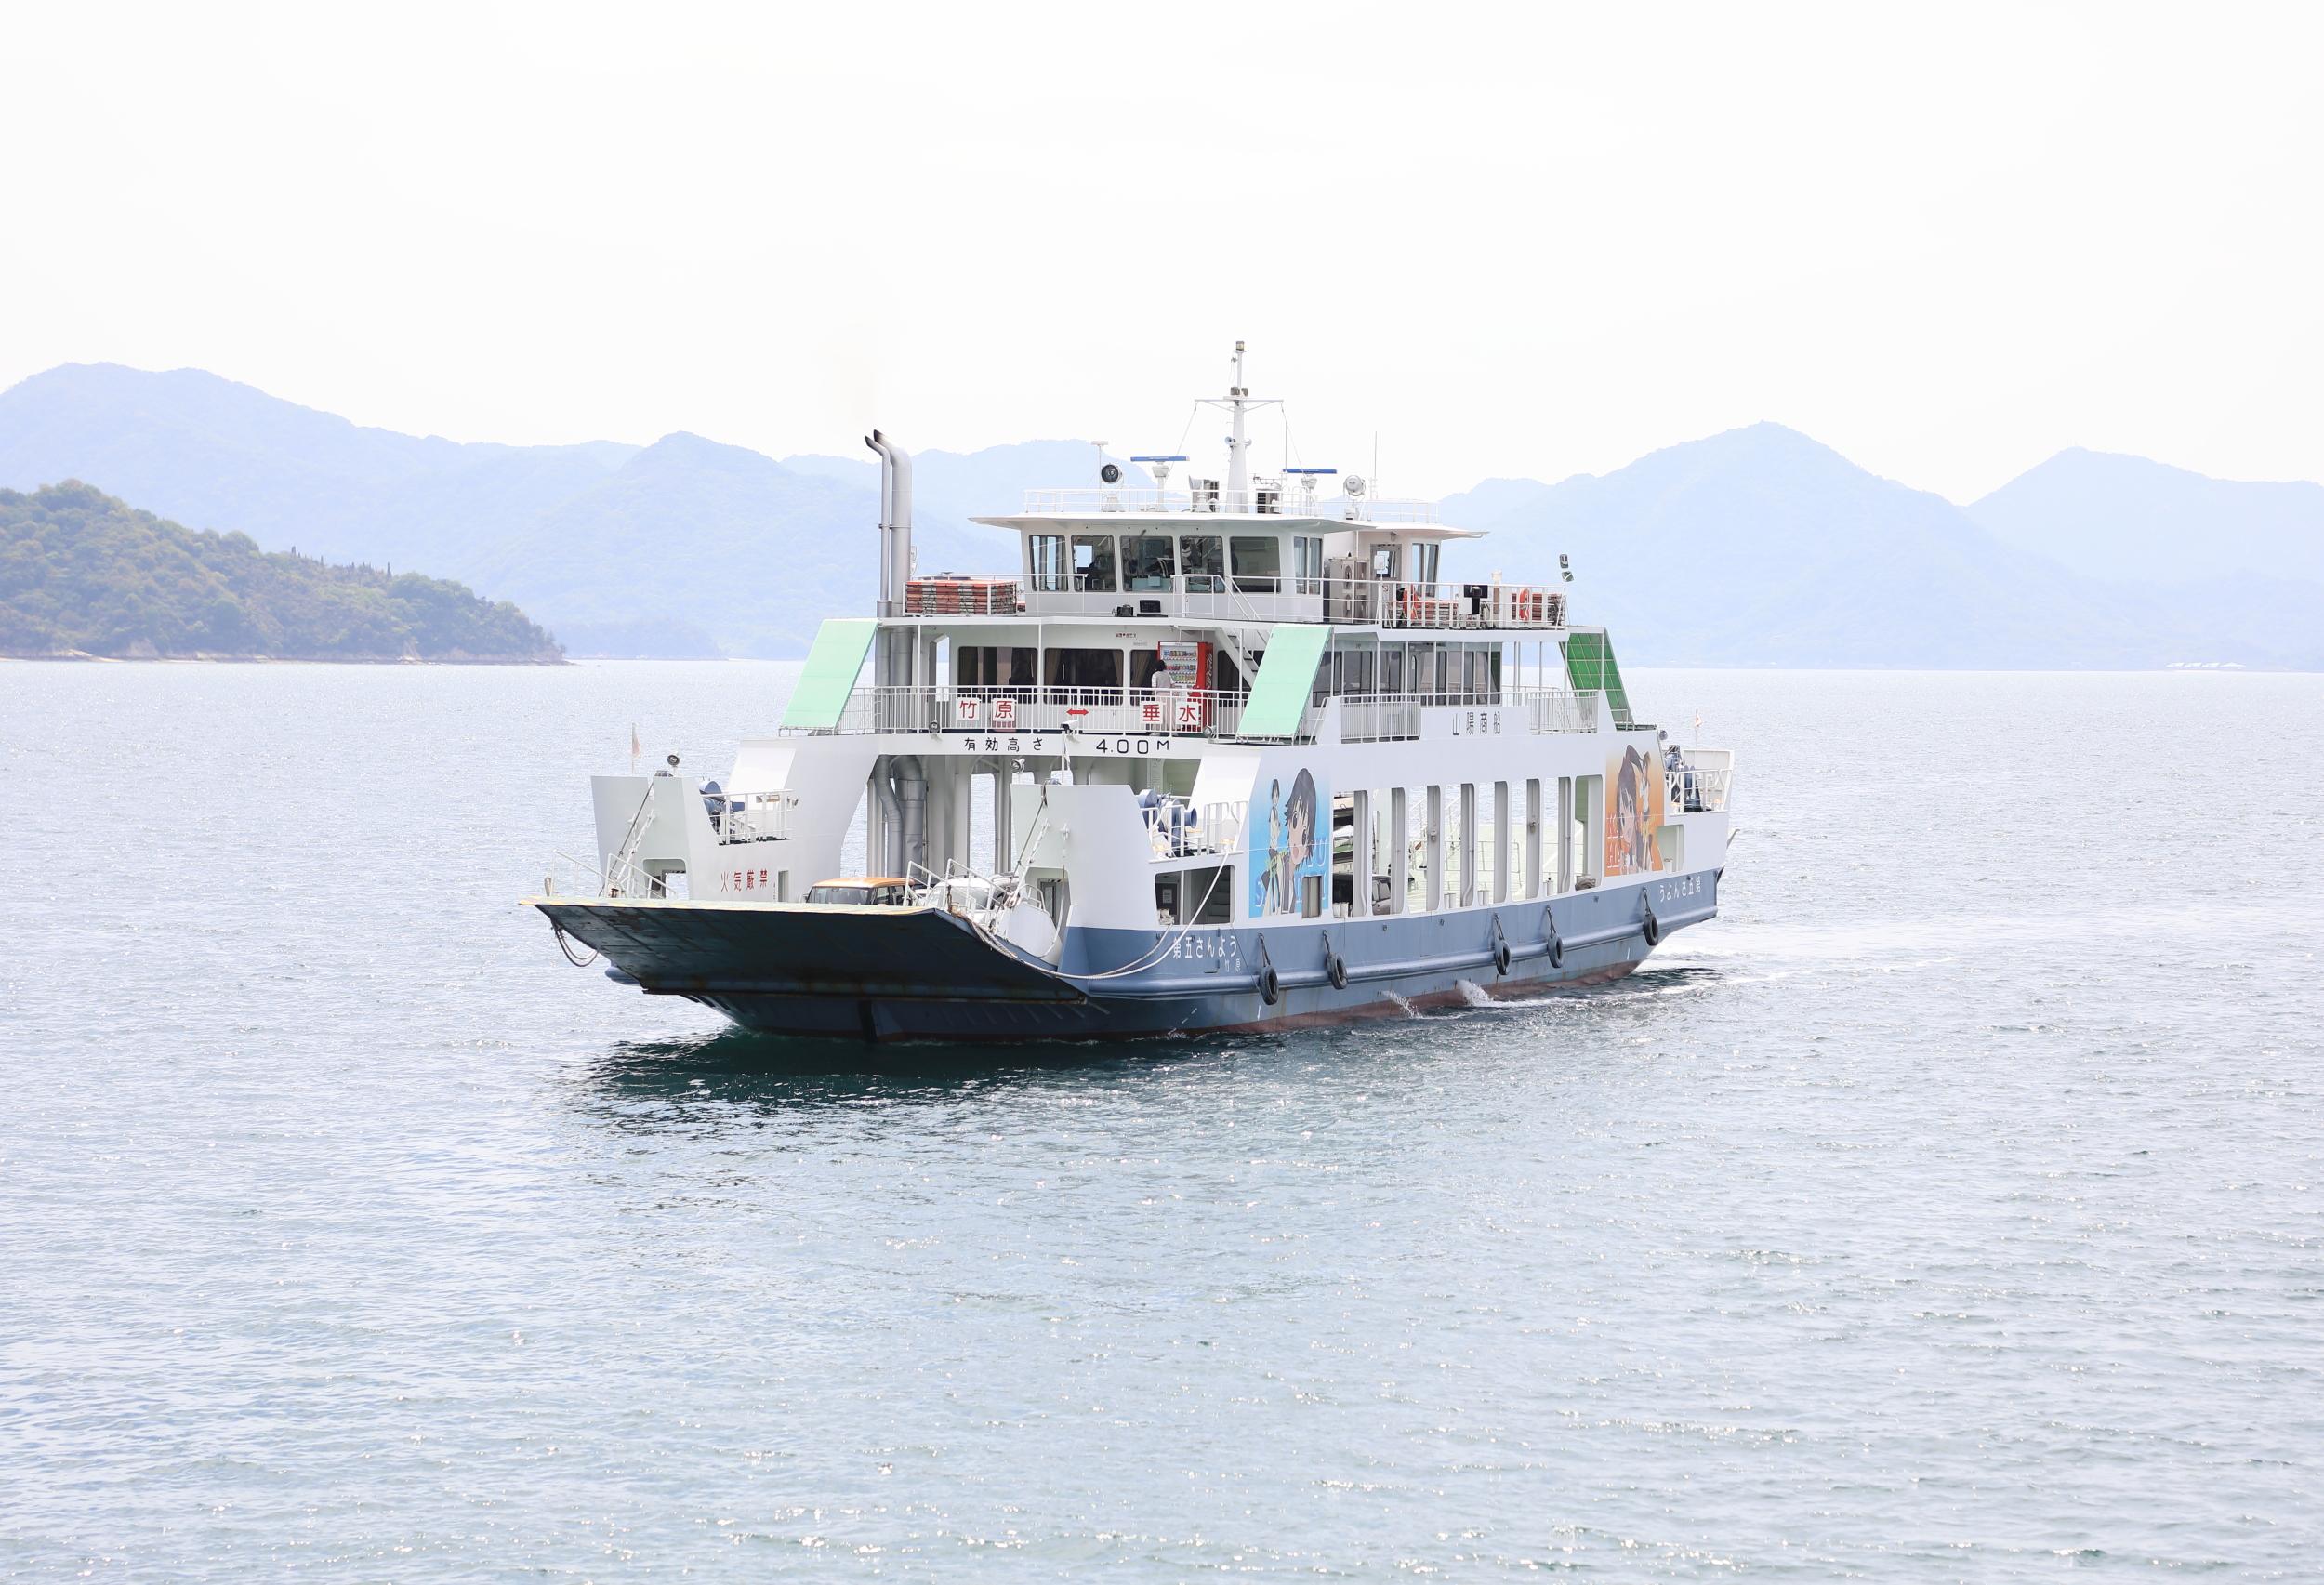 A ferry from the city of Takehara on the mainland Honshu Island traveling to the port of Tarumi on Osakikamijima.